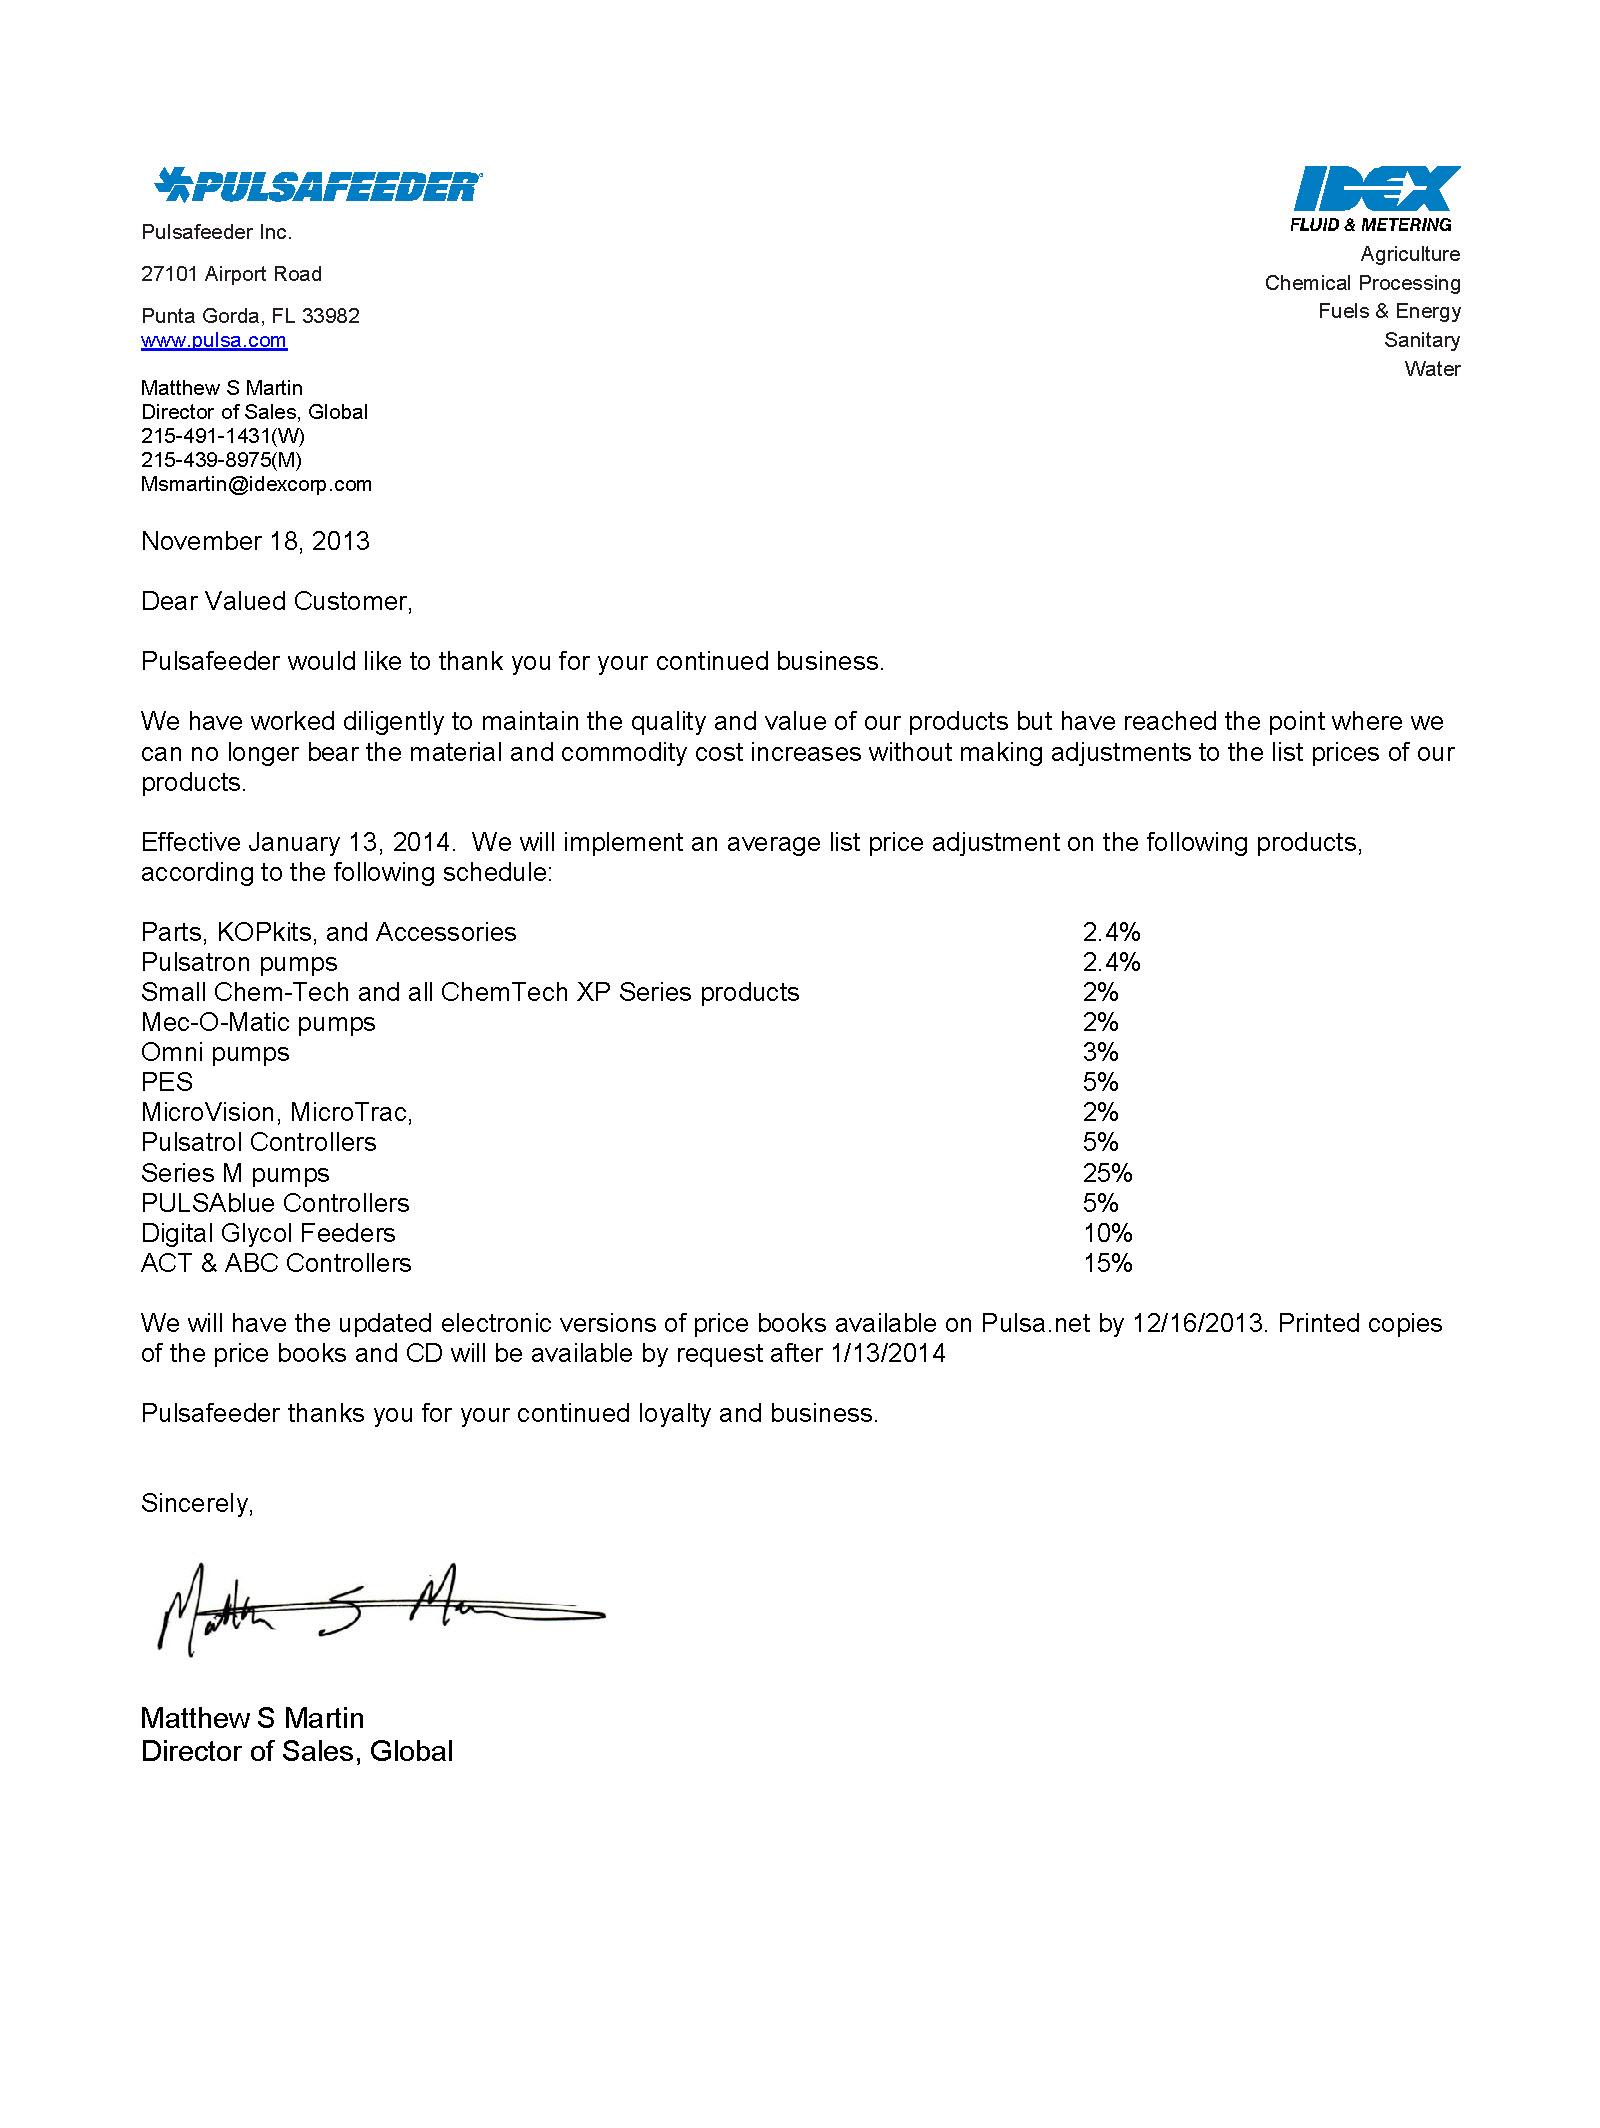 spo price update letter